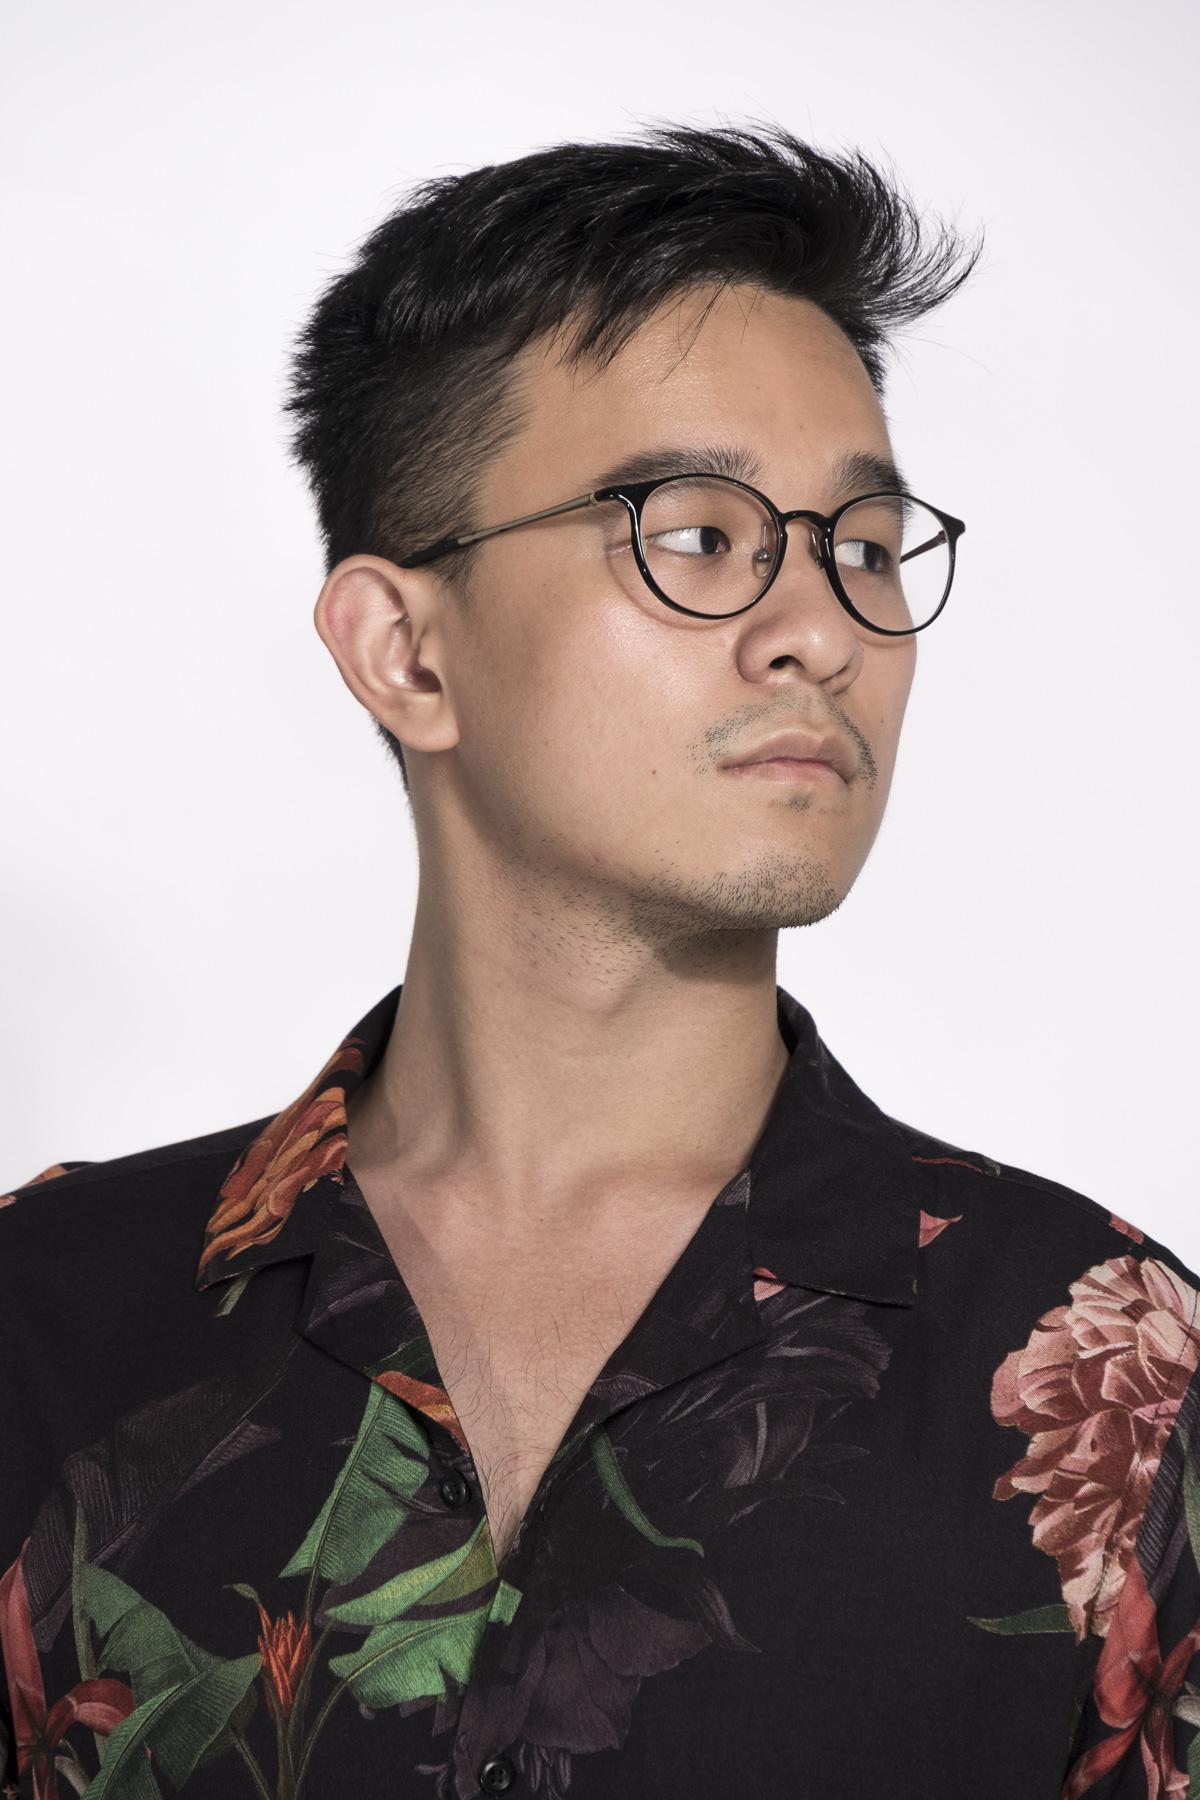 Fashion photography studio singapore services asia photographer photoshoot model man portrait color